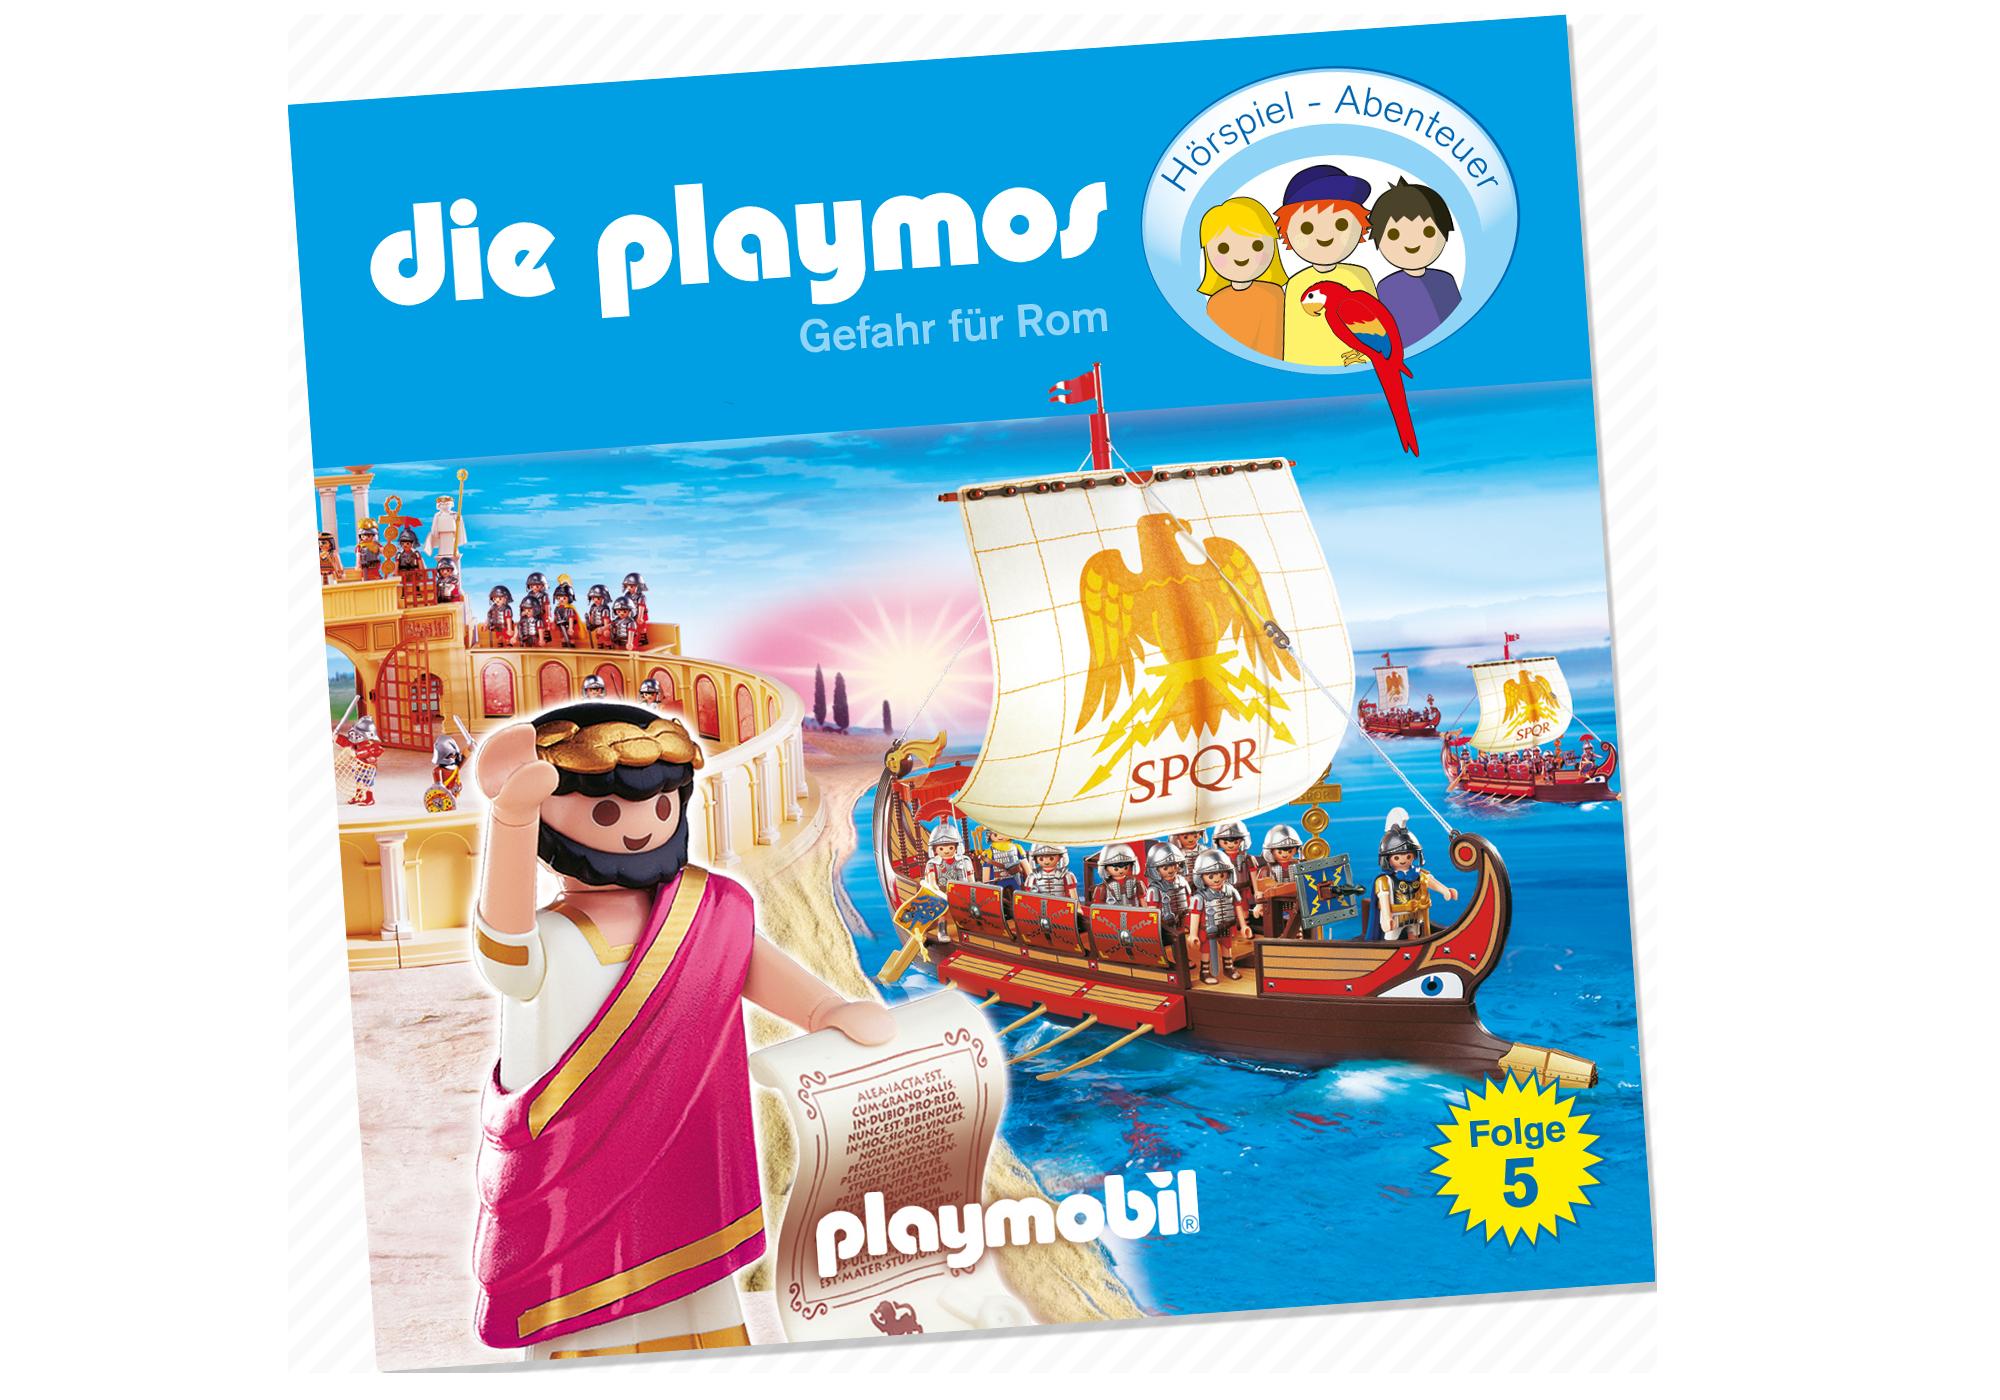 http://media.playmobil.com/i/playmobil/80157_product_detail